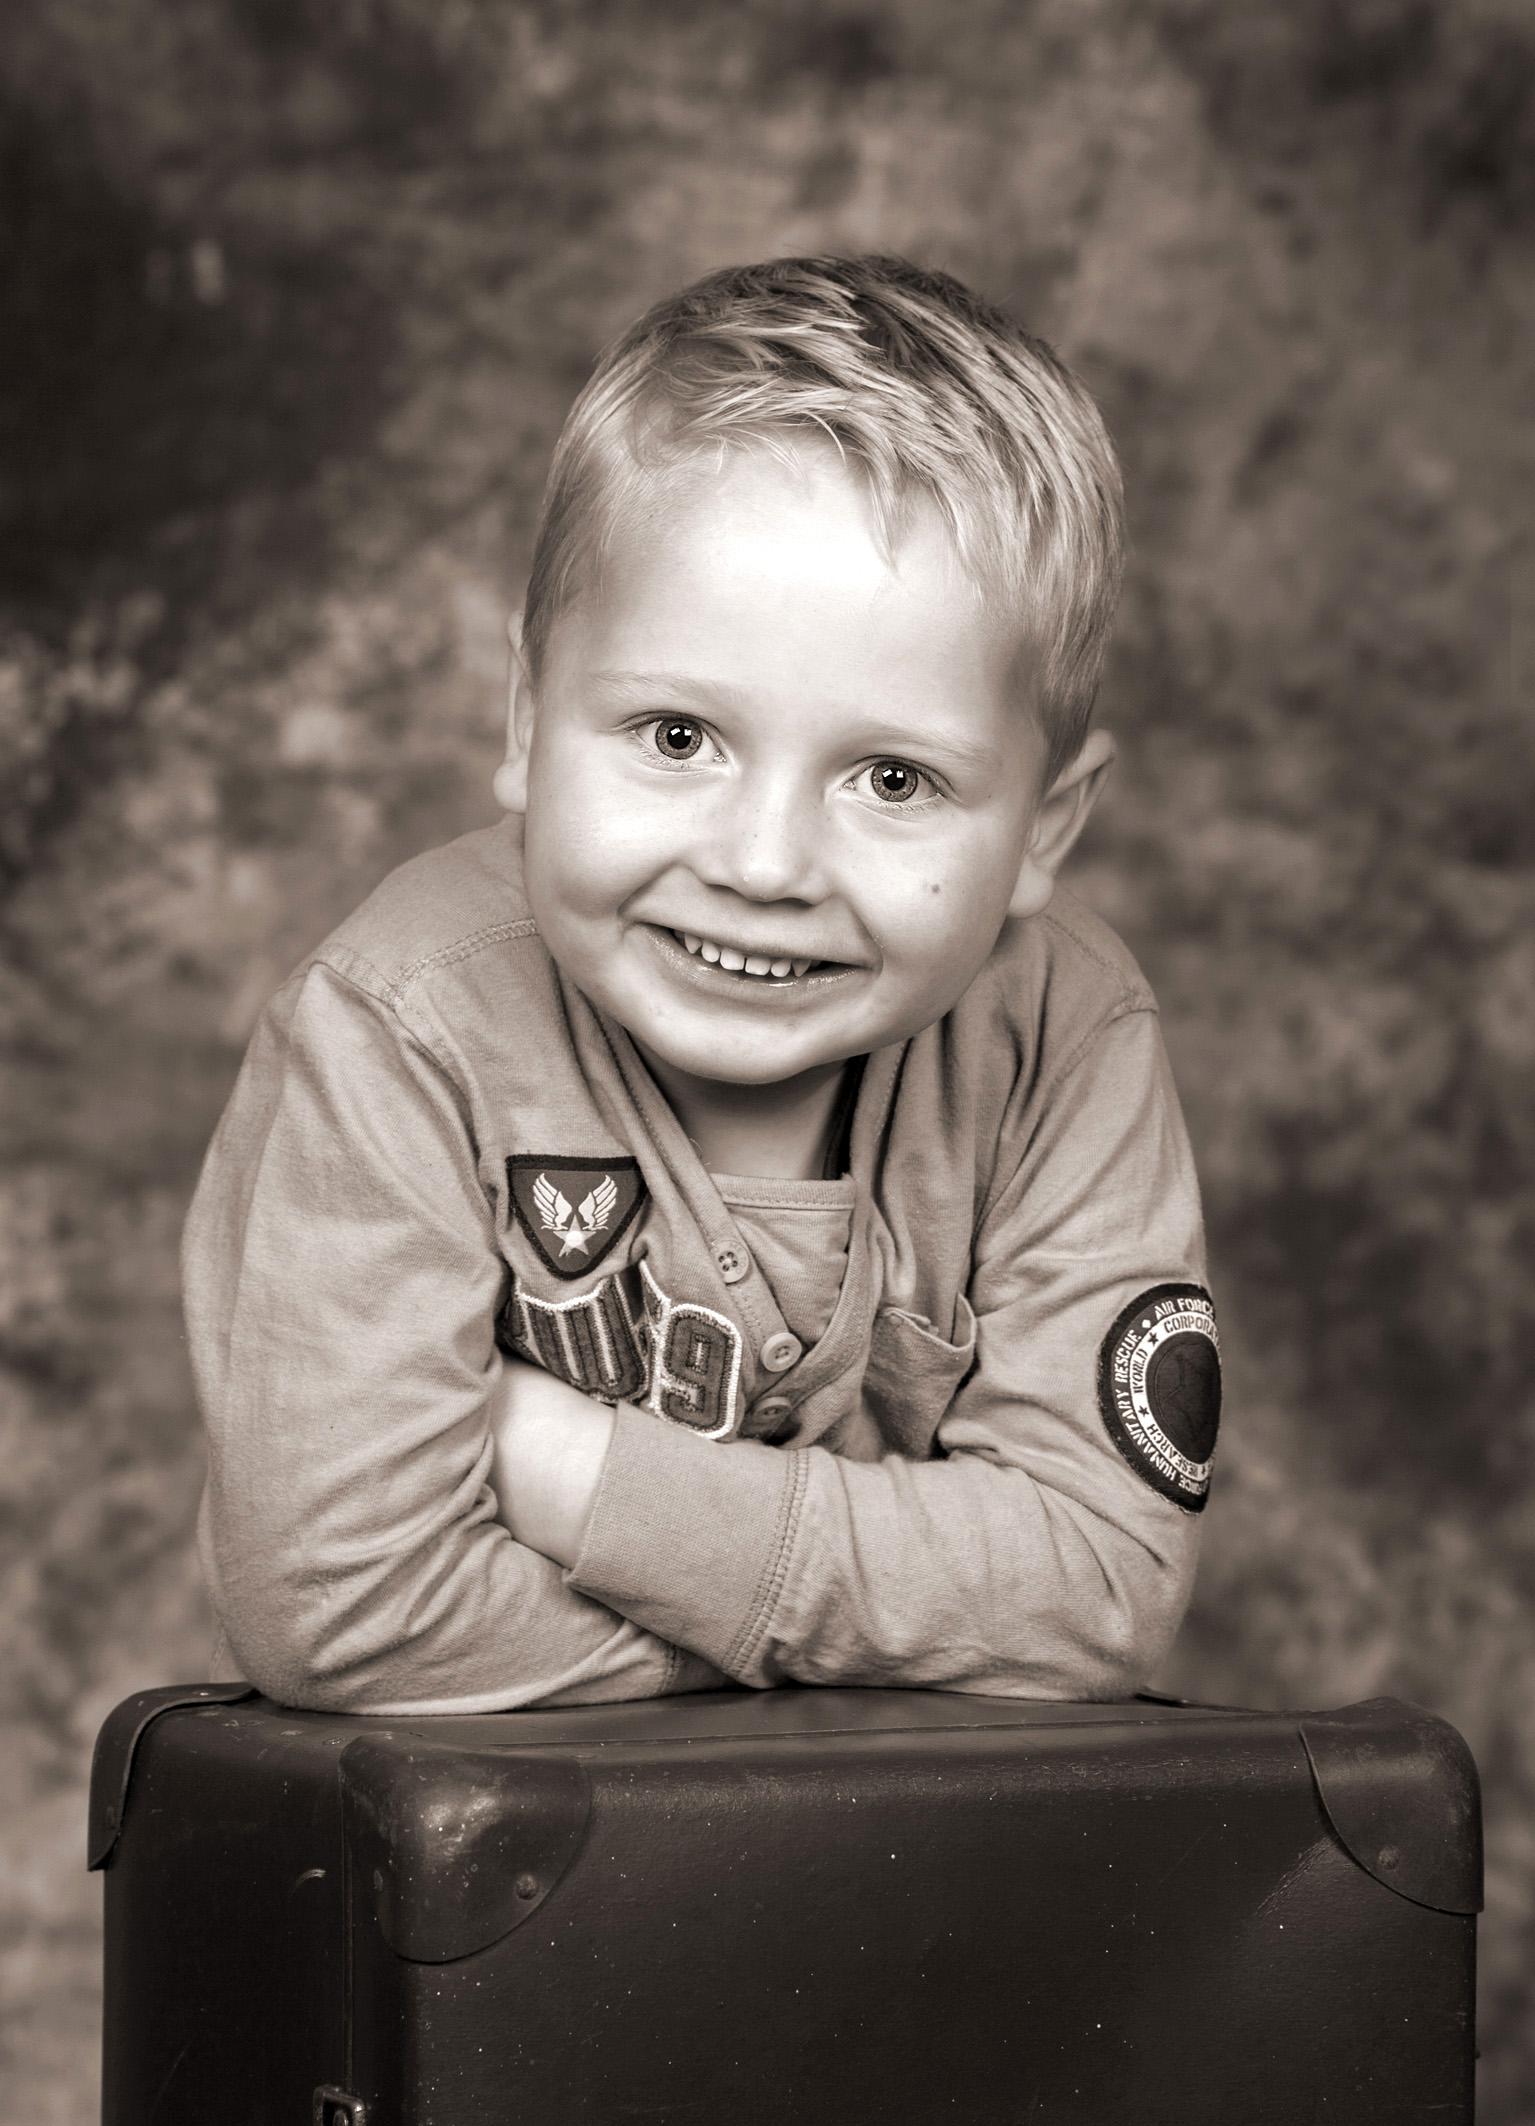 Børnefotografi - dreng - bruntonet